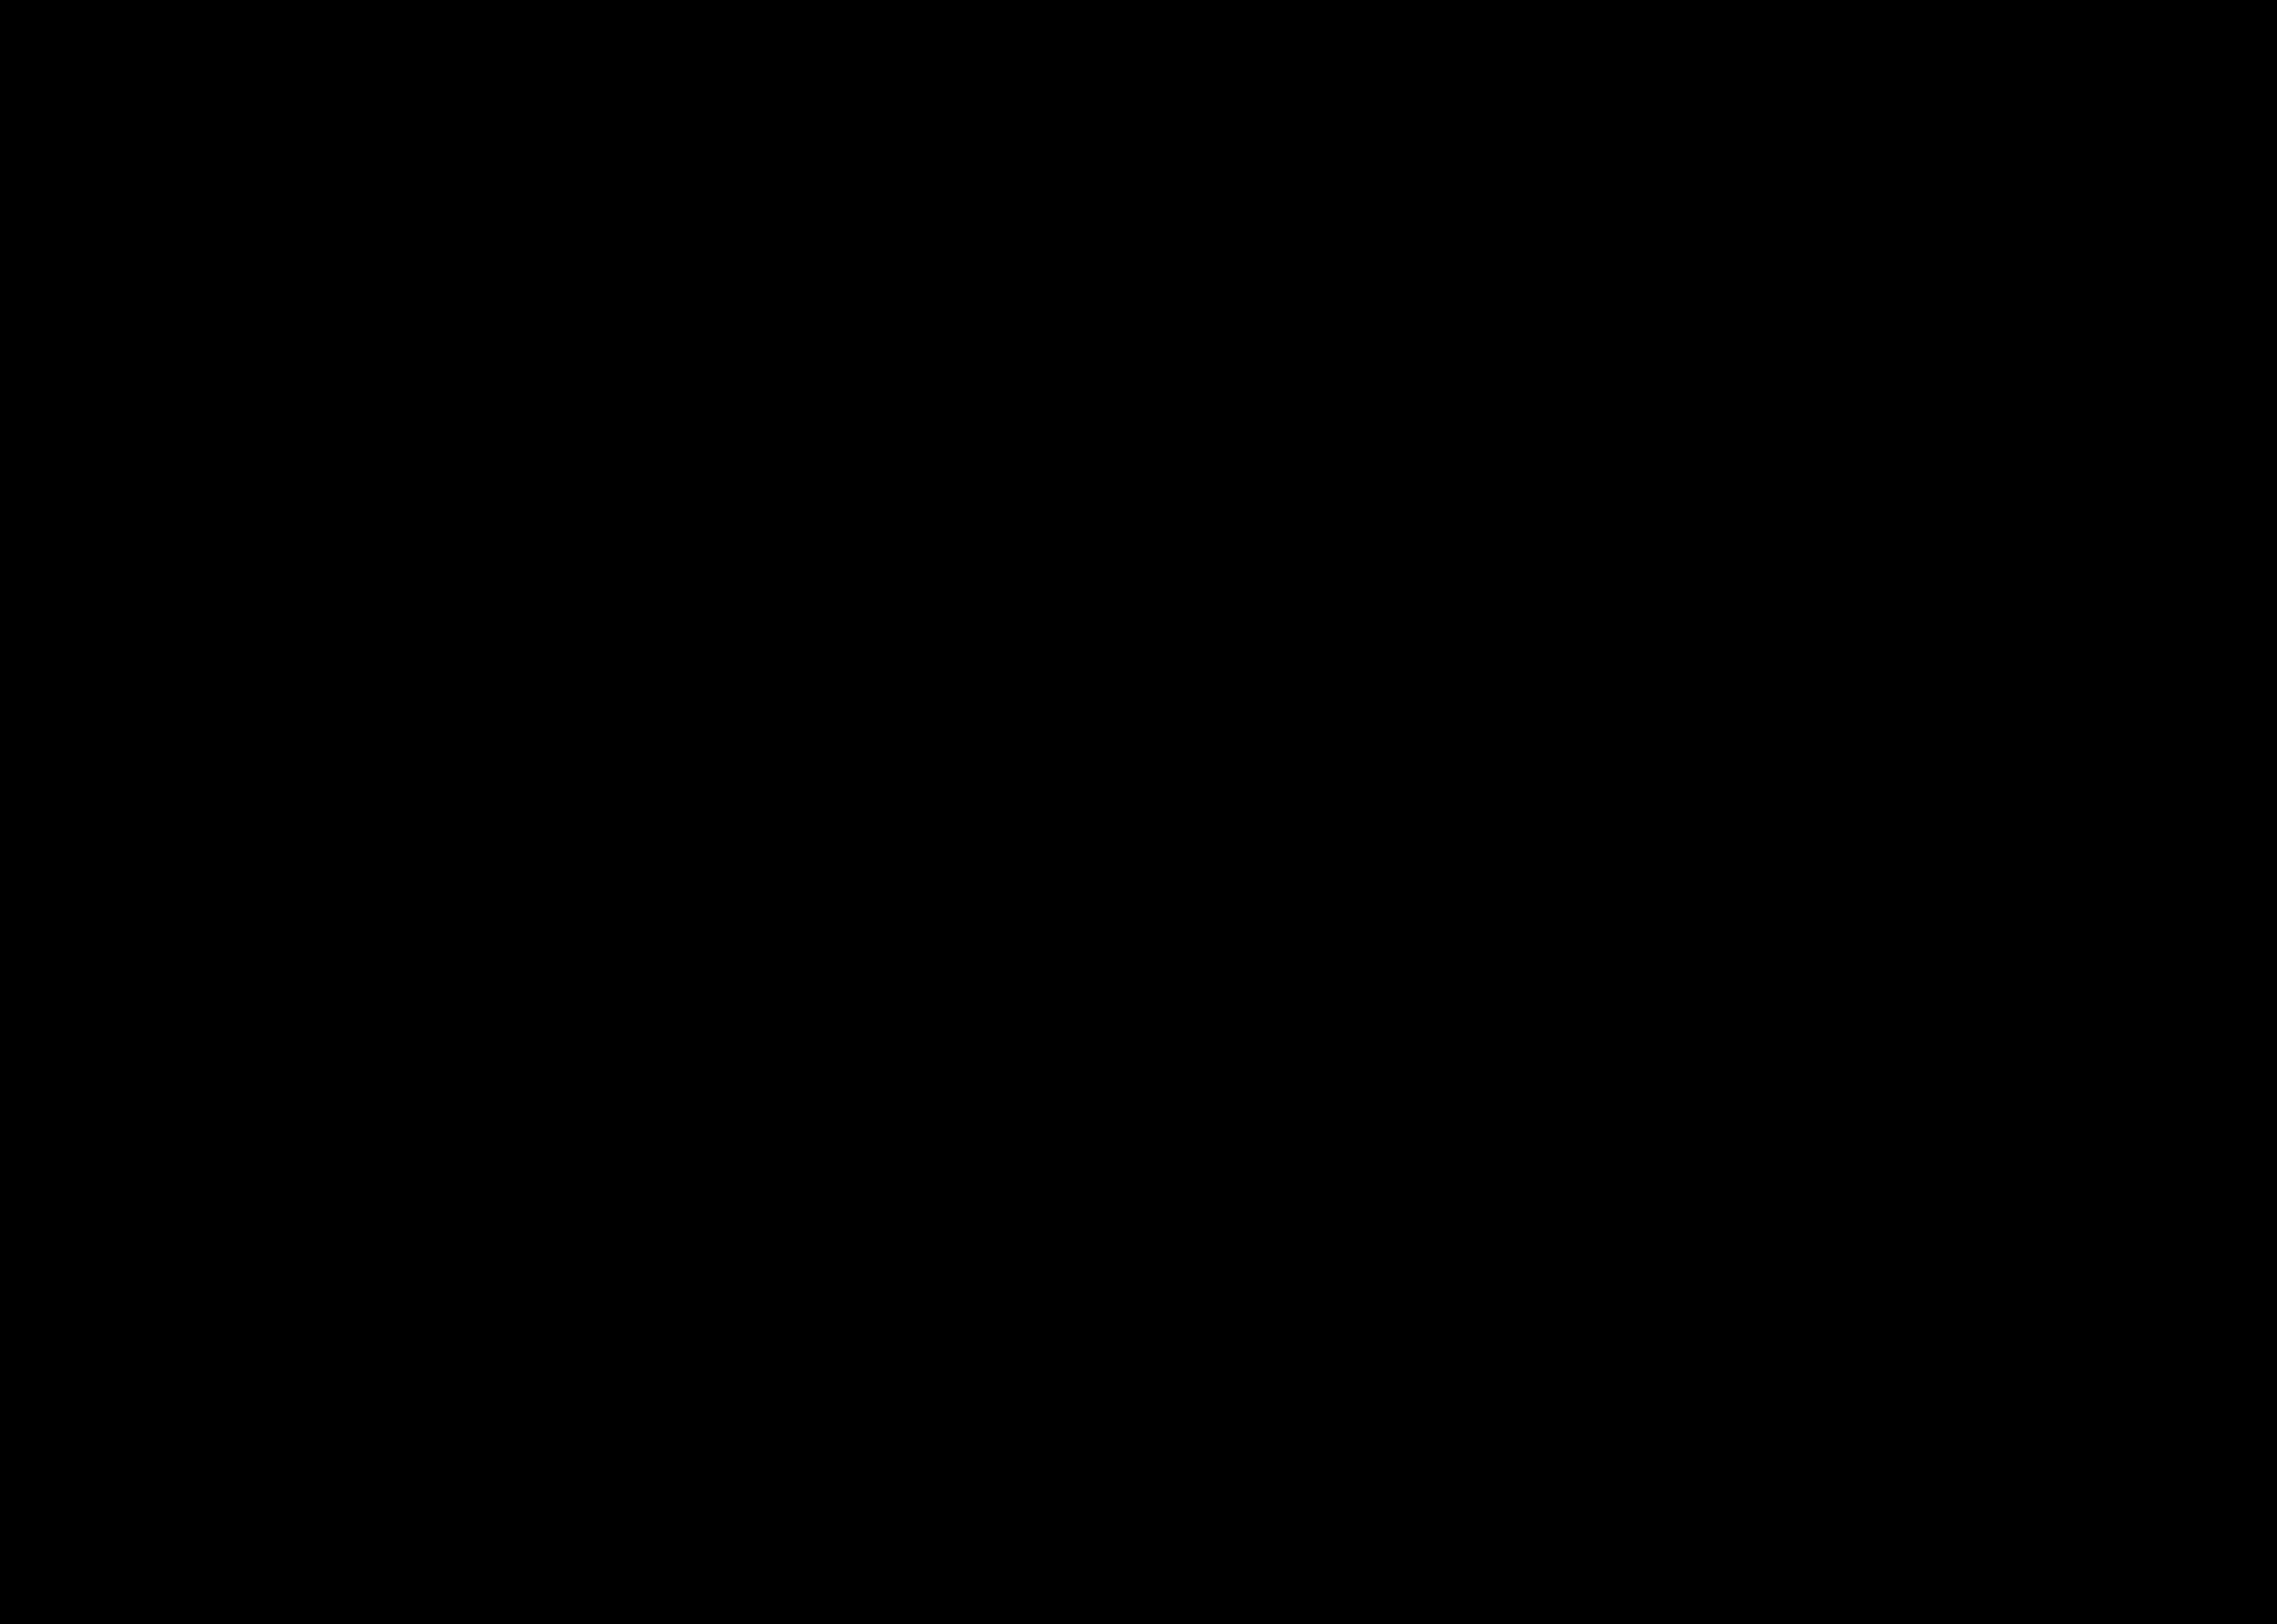 Uzi silhouette big image. Clipart gun pdf